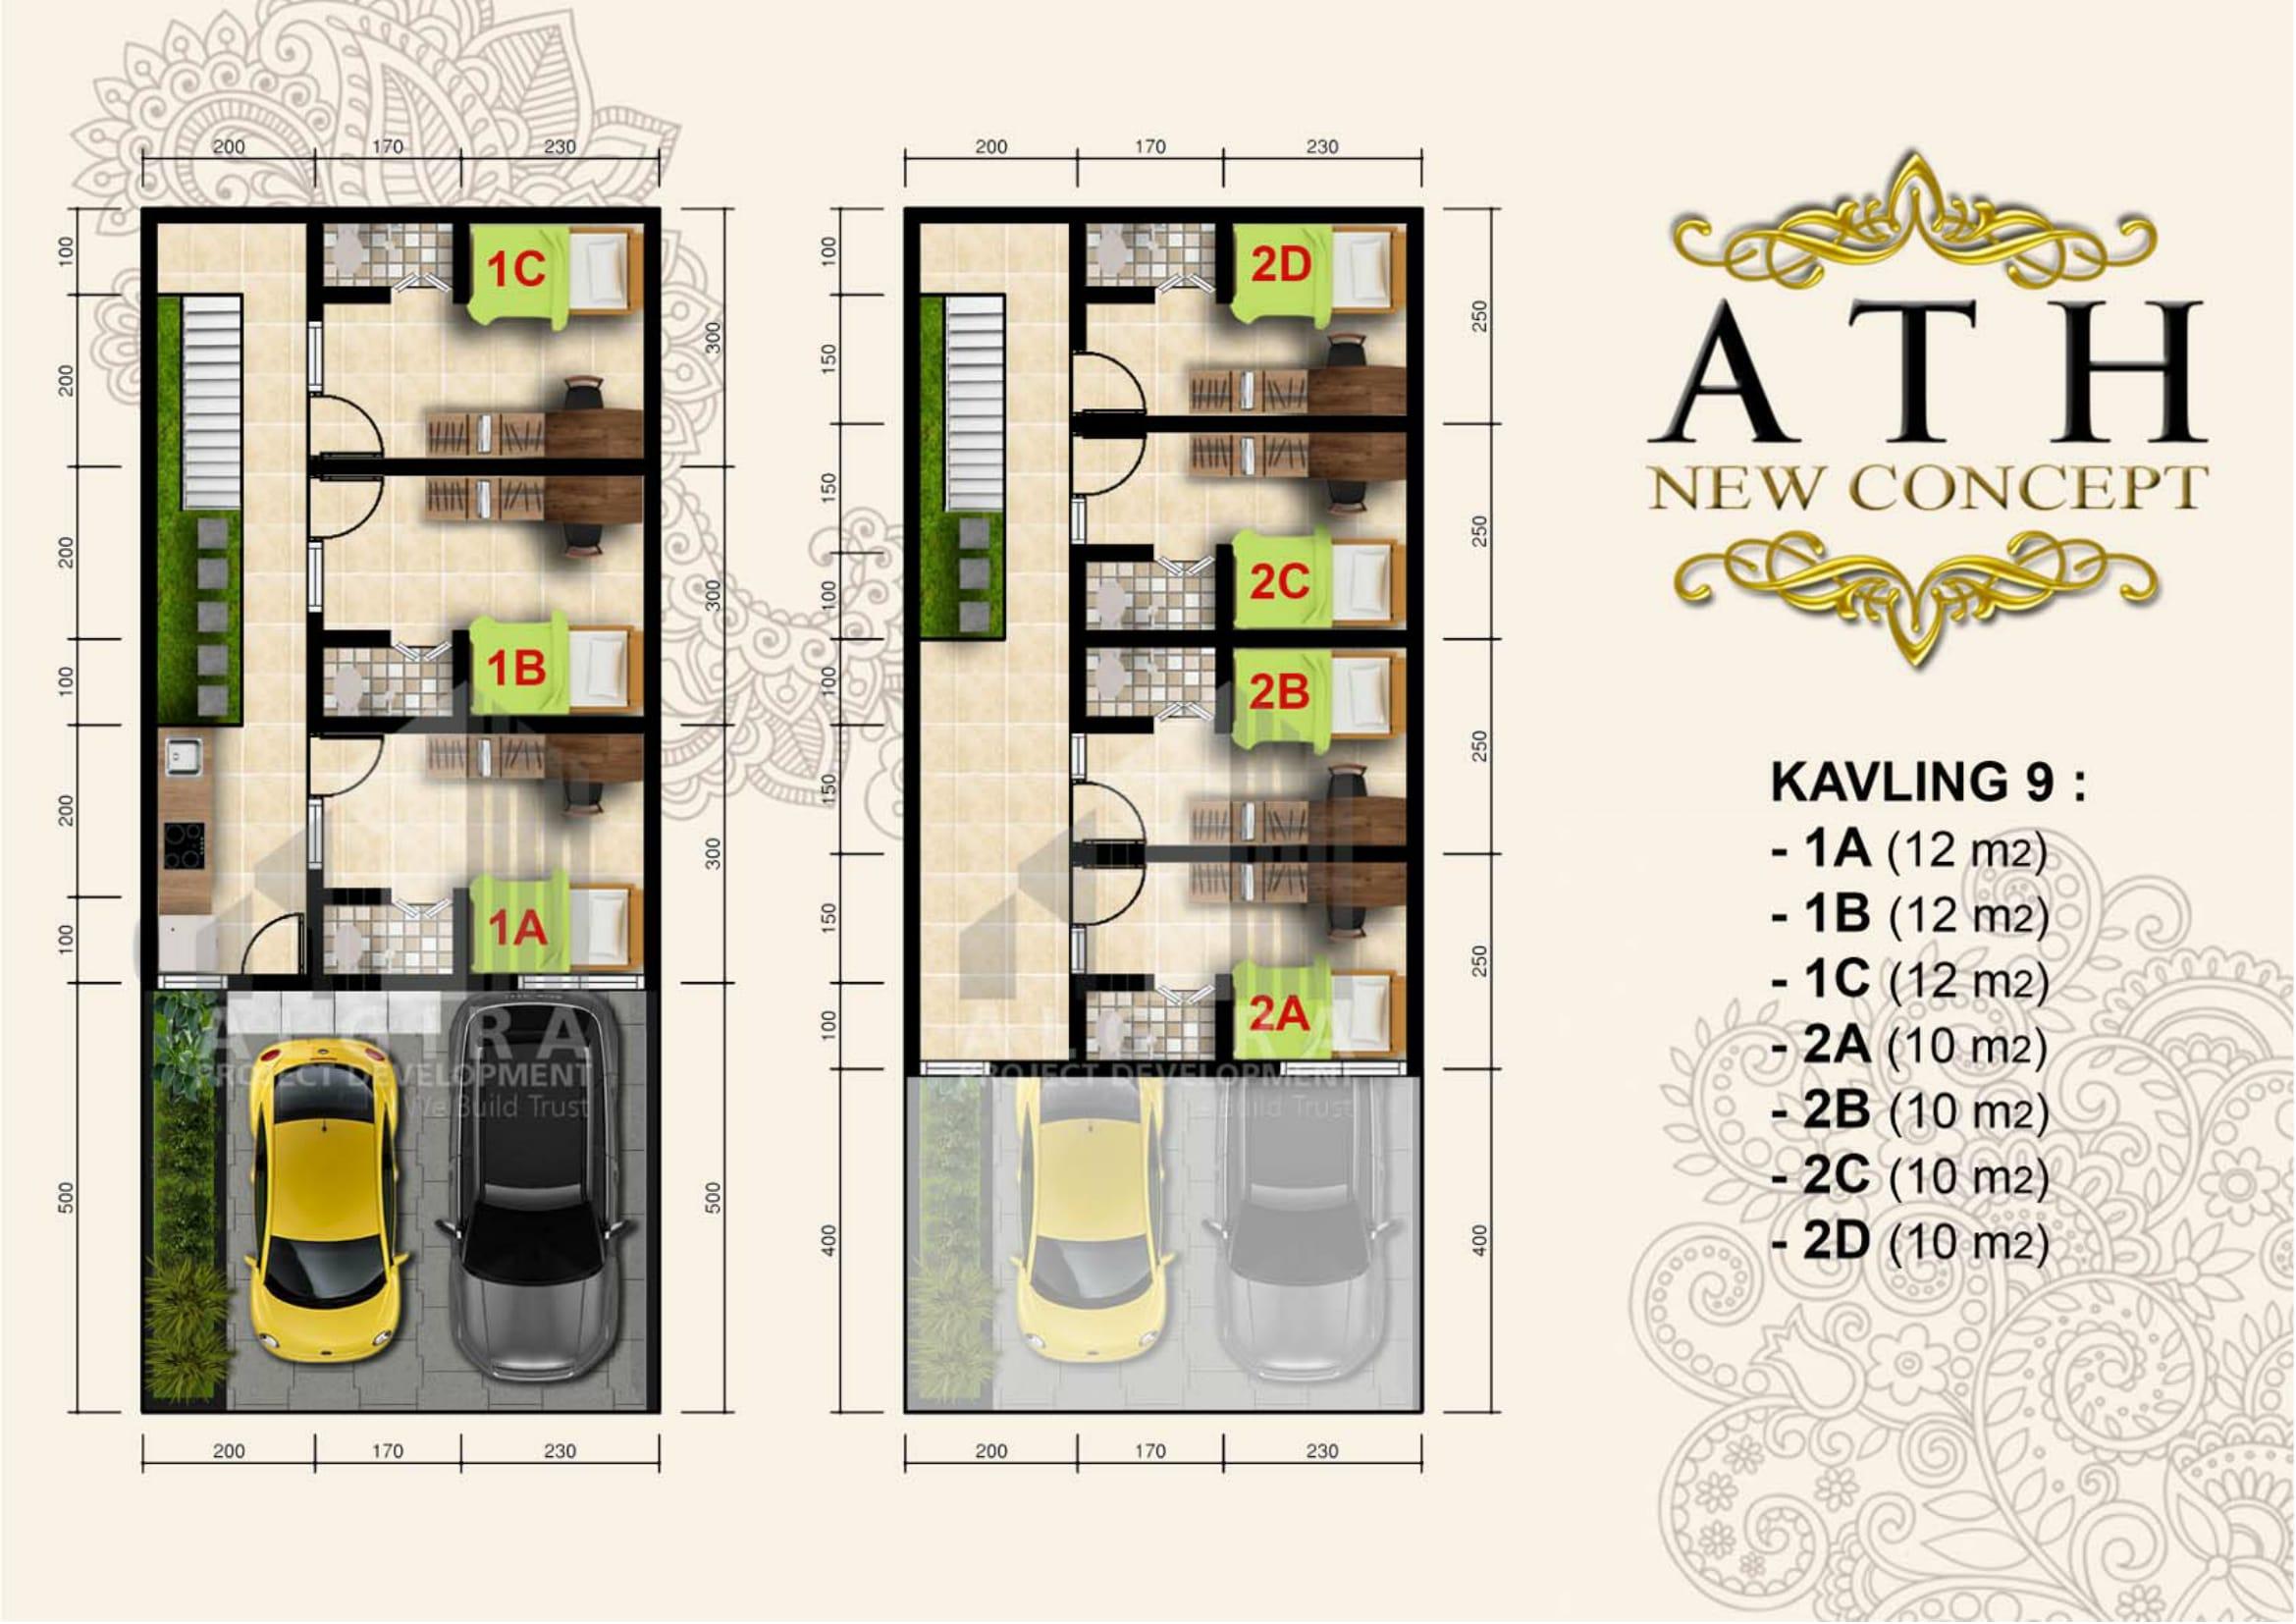 klikkprsyariah.ATH-new-concept-09